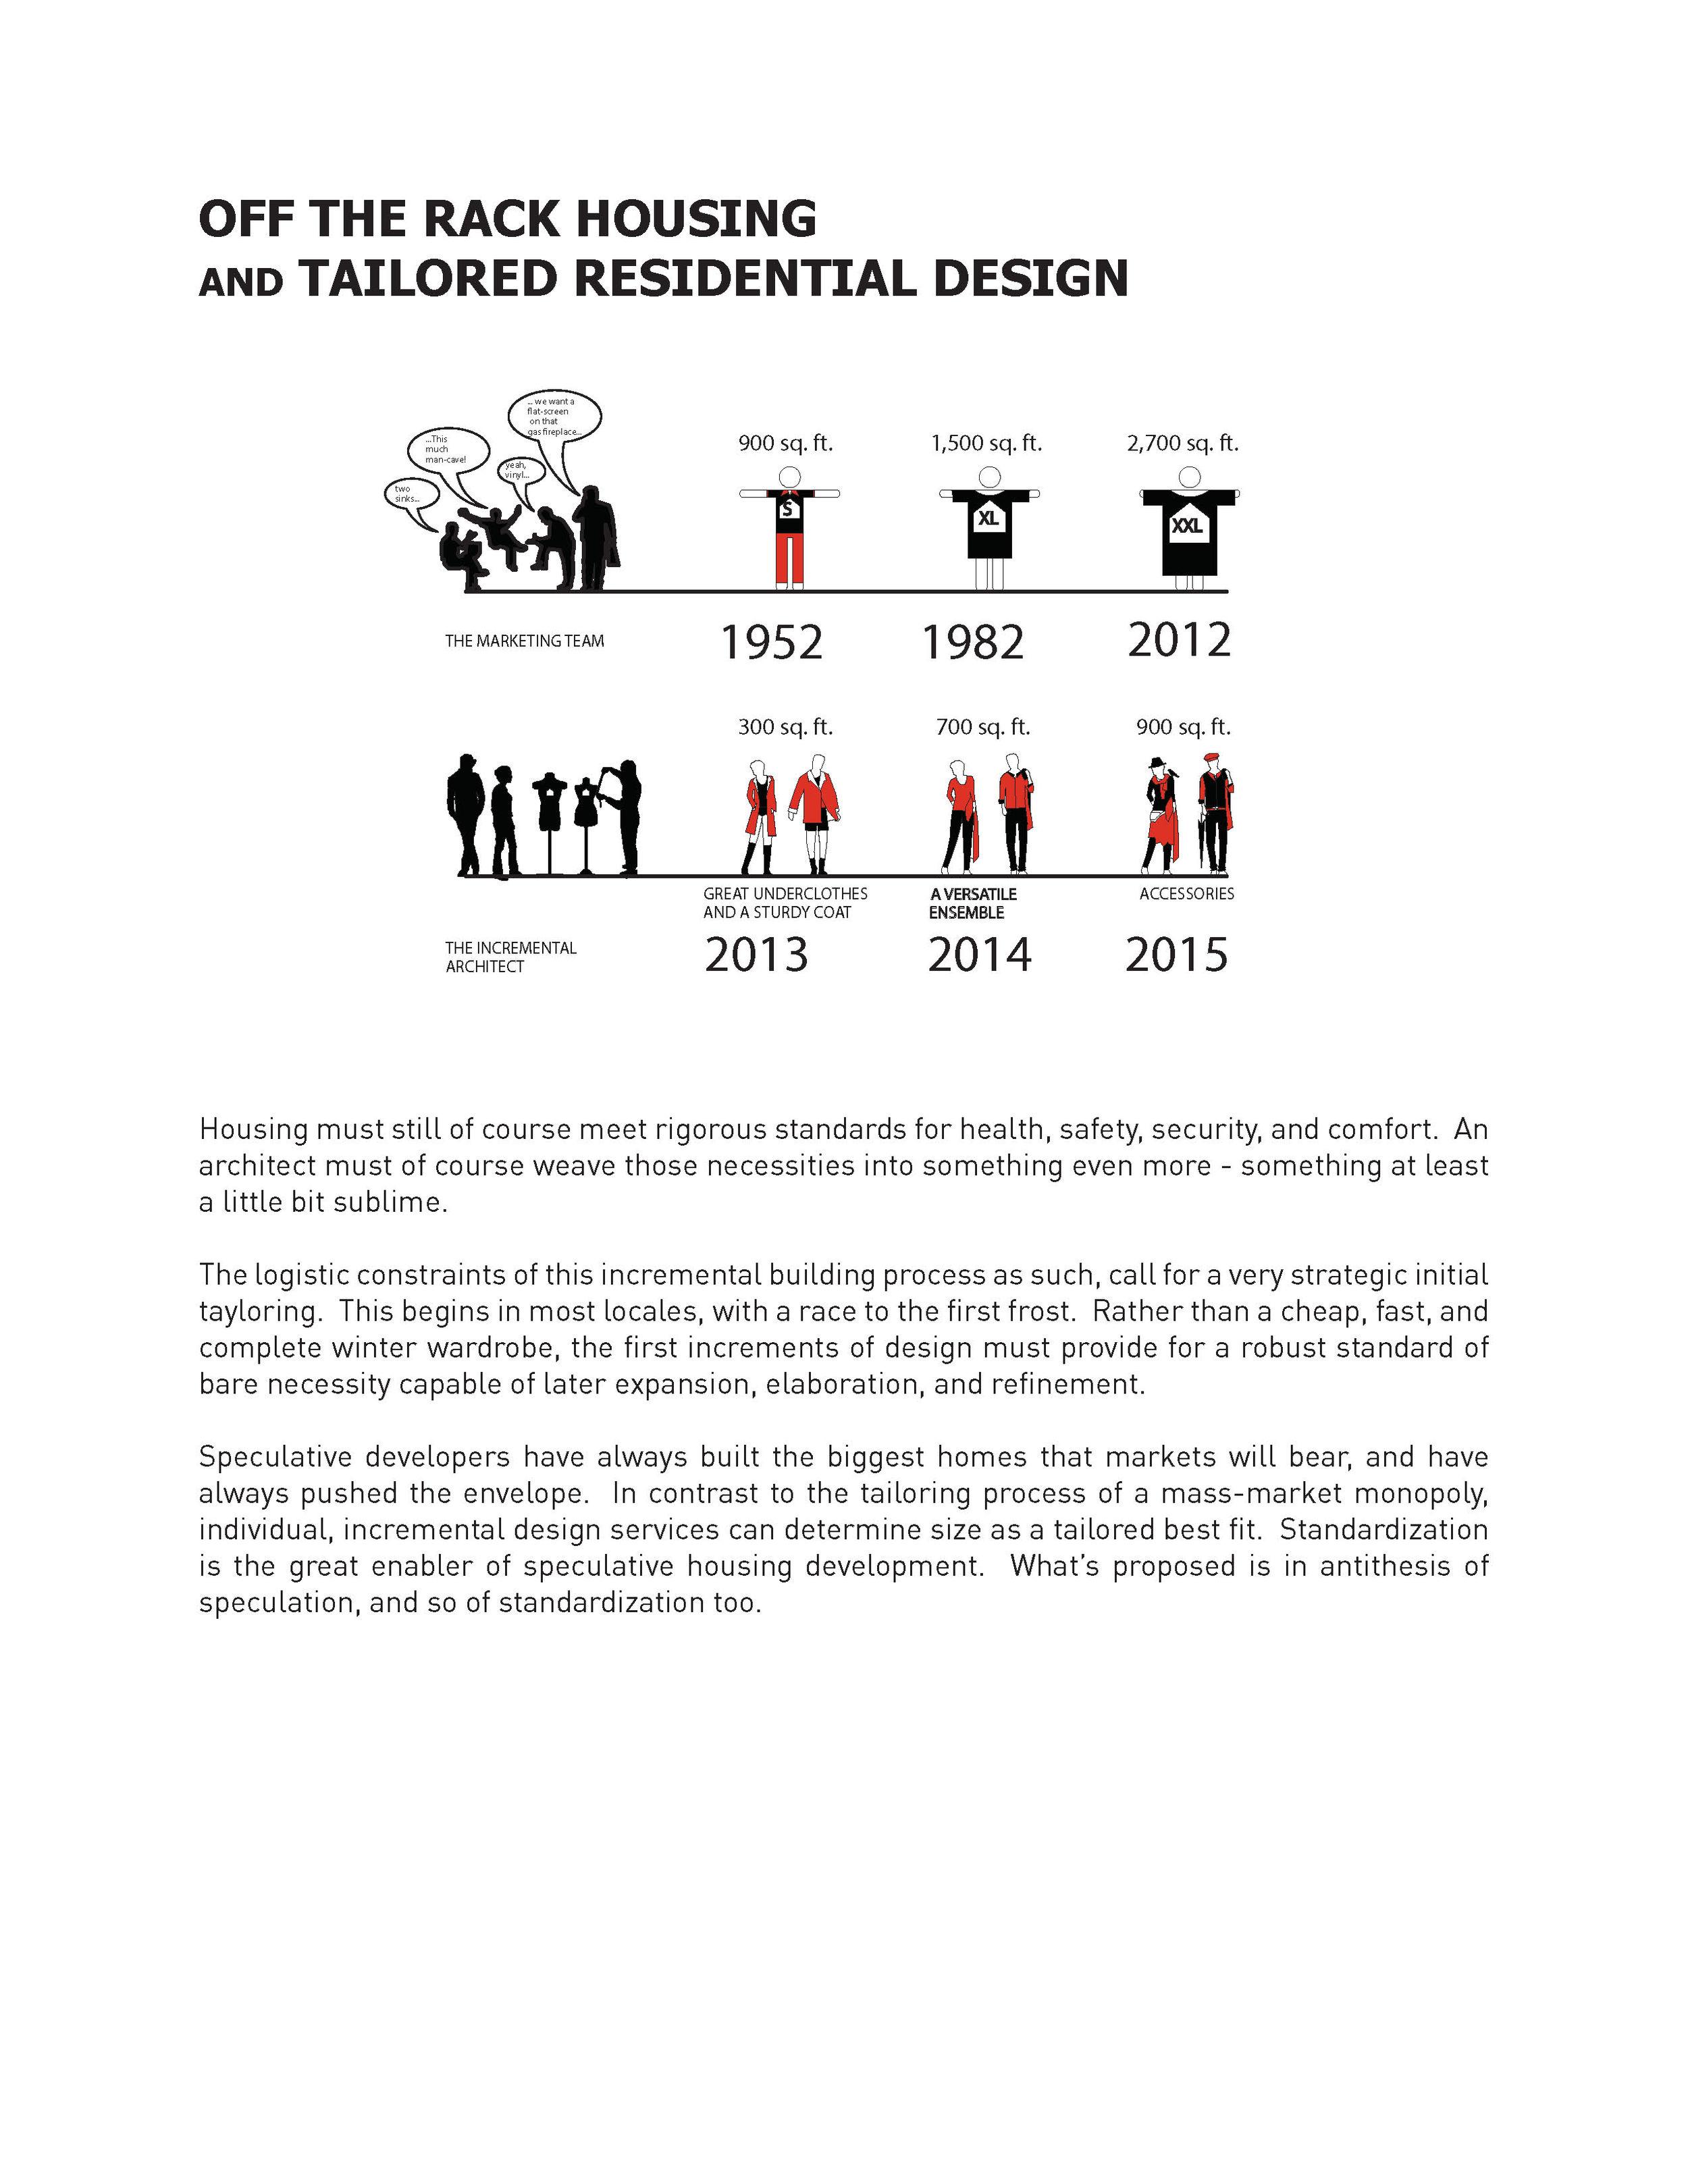 DSA_CMiller_Thesis_Slides_Boards_03_30_2013_Page_11.jpg